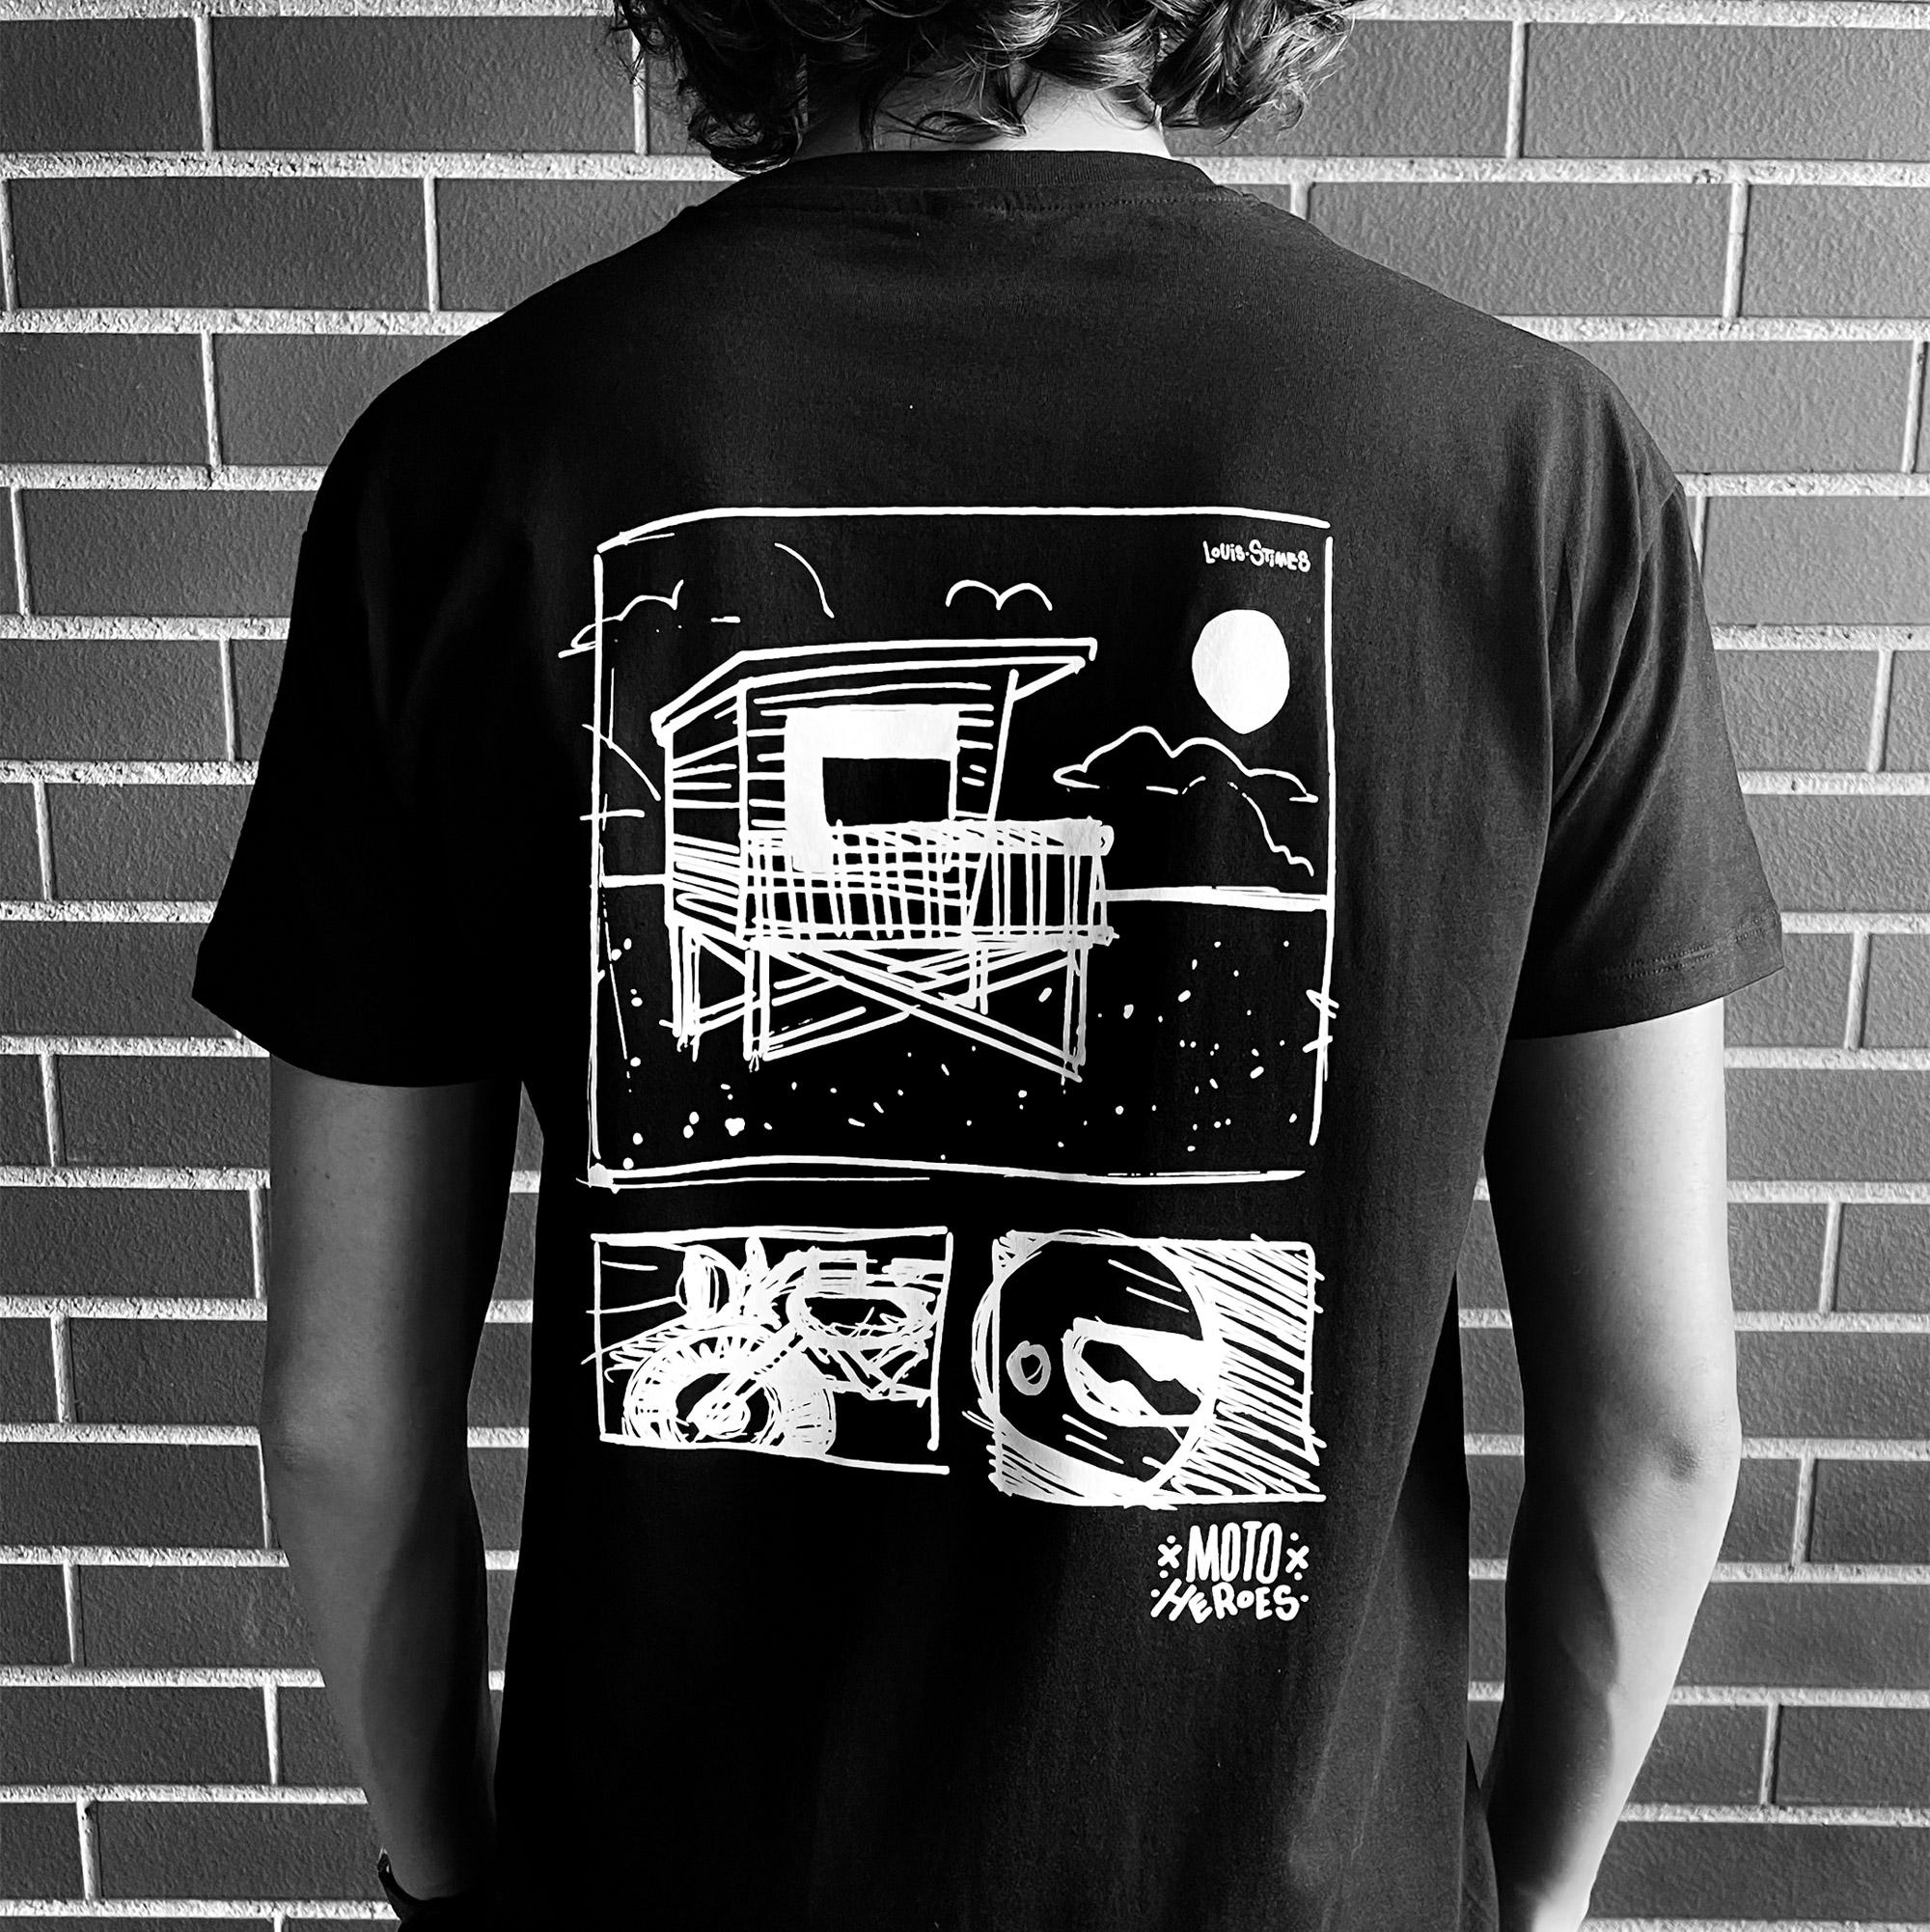 Tee-shirt Moto Heroes Louis Stimes Cabane noir